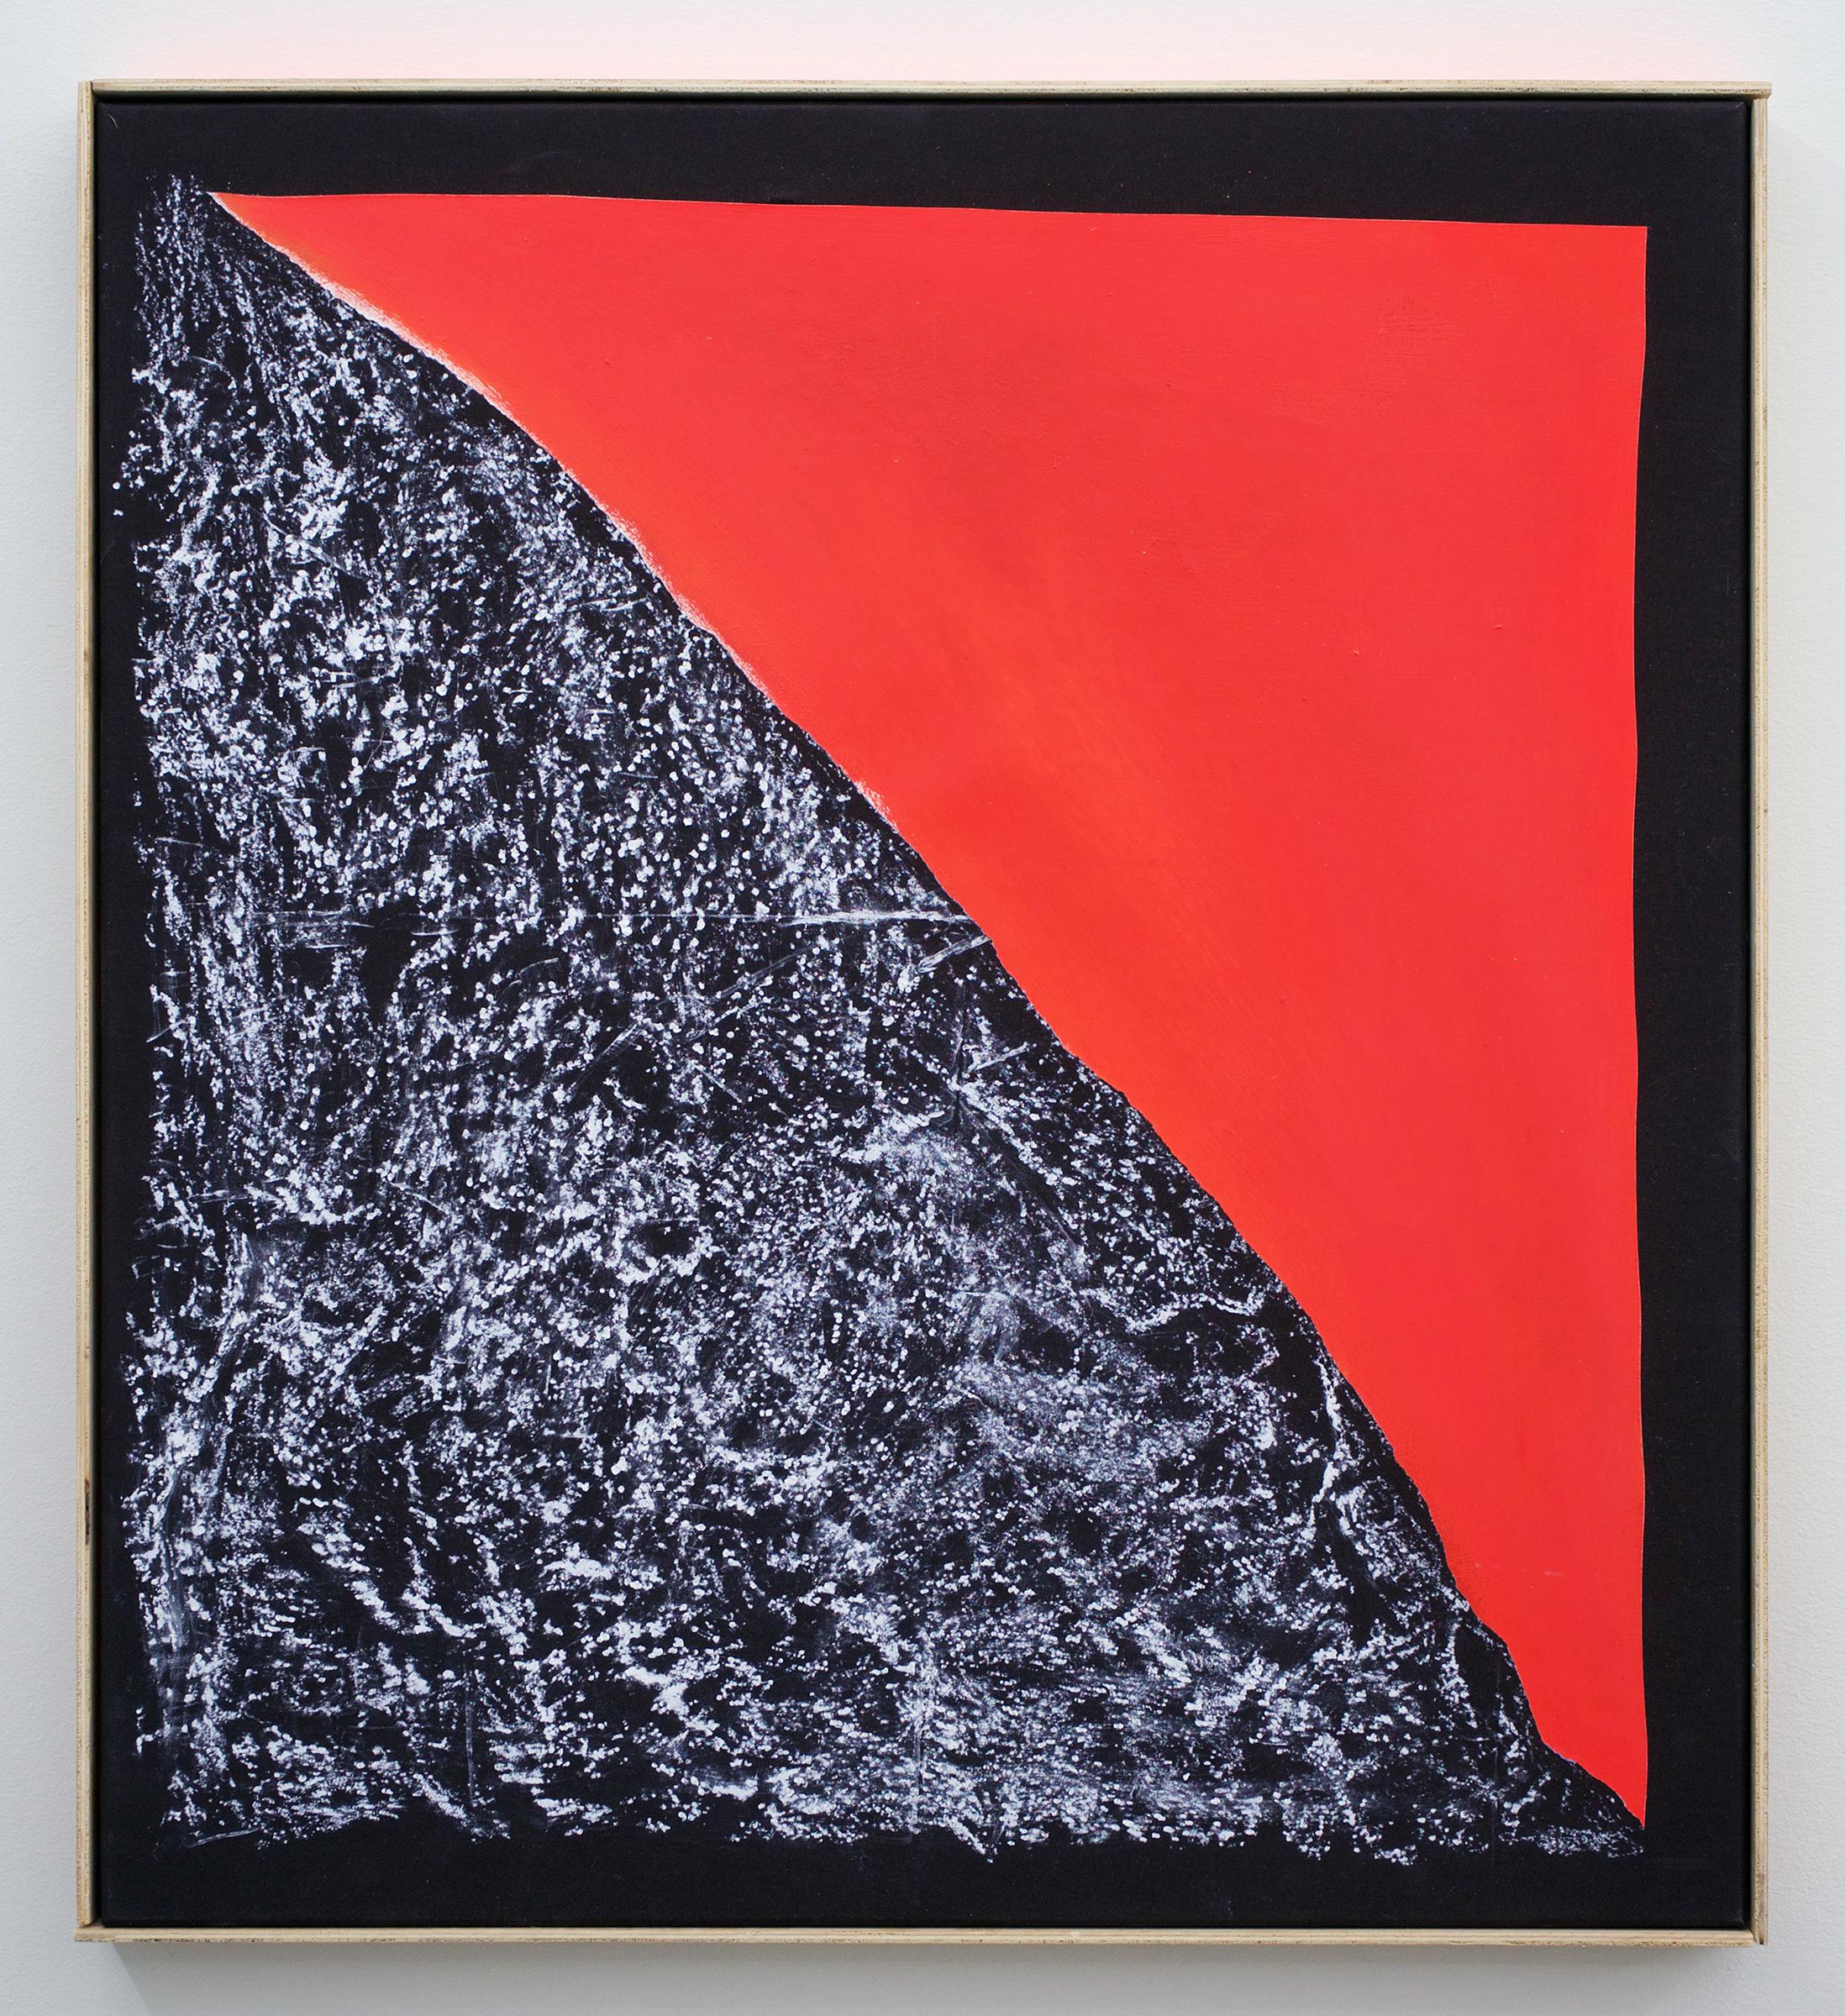 "CHRIS DUNCAN   Sunset – Angles Landing, Zion Canyon Utah, April 5, 2017 , 2017, acrylic and crayon on fabric, 27 1/2"" x 26 1/2"""